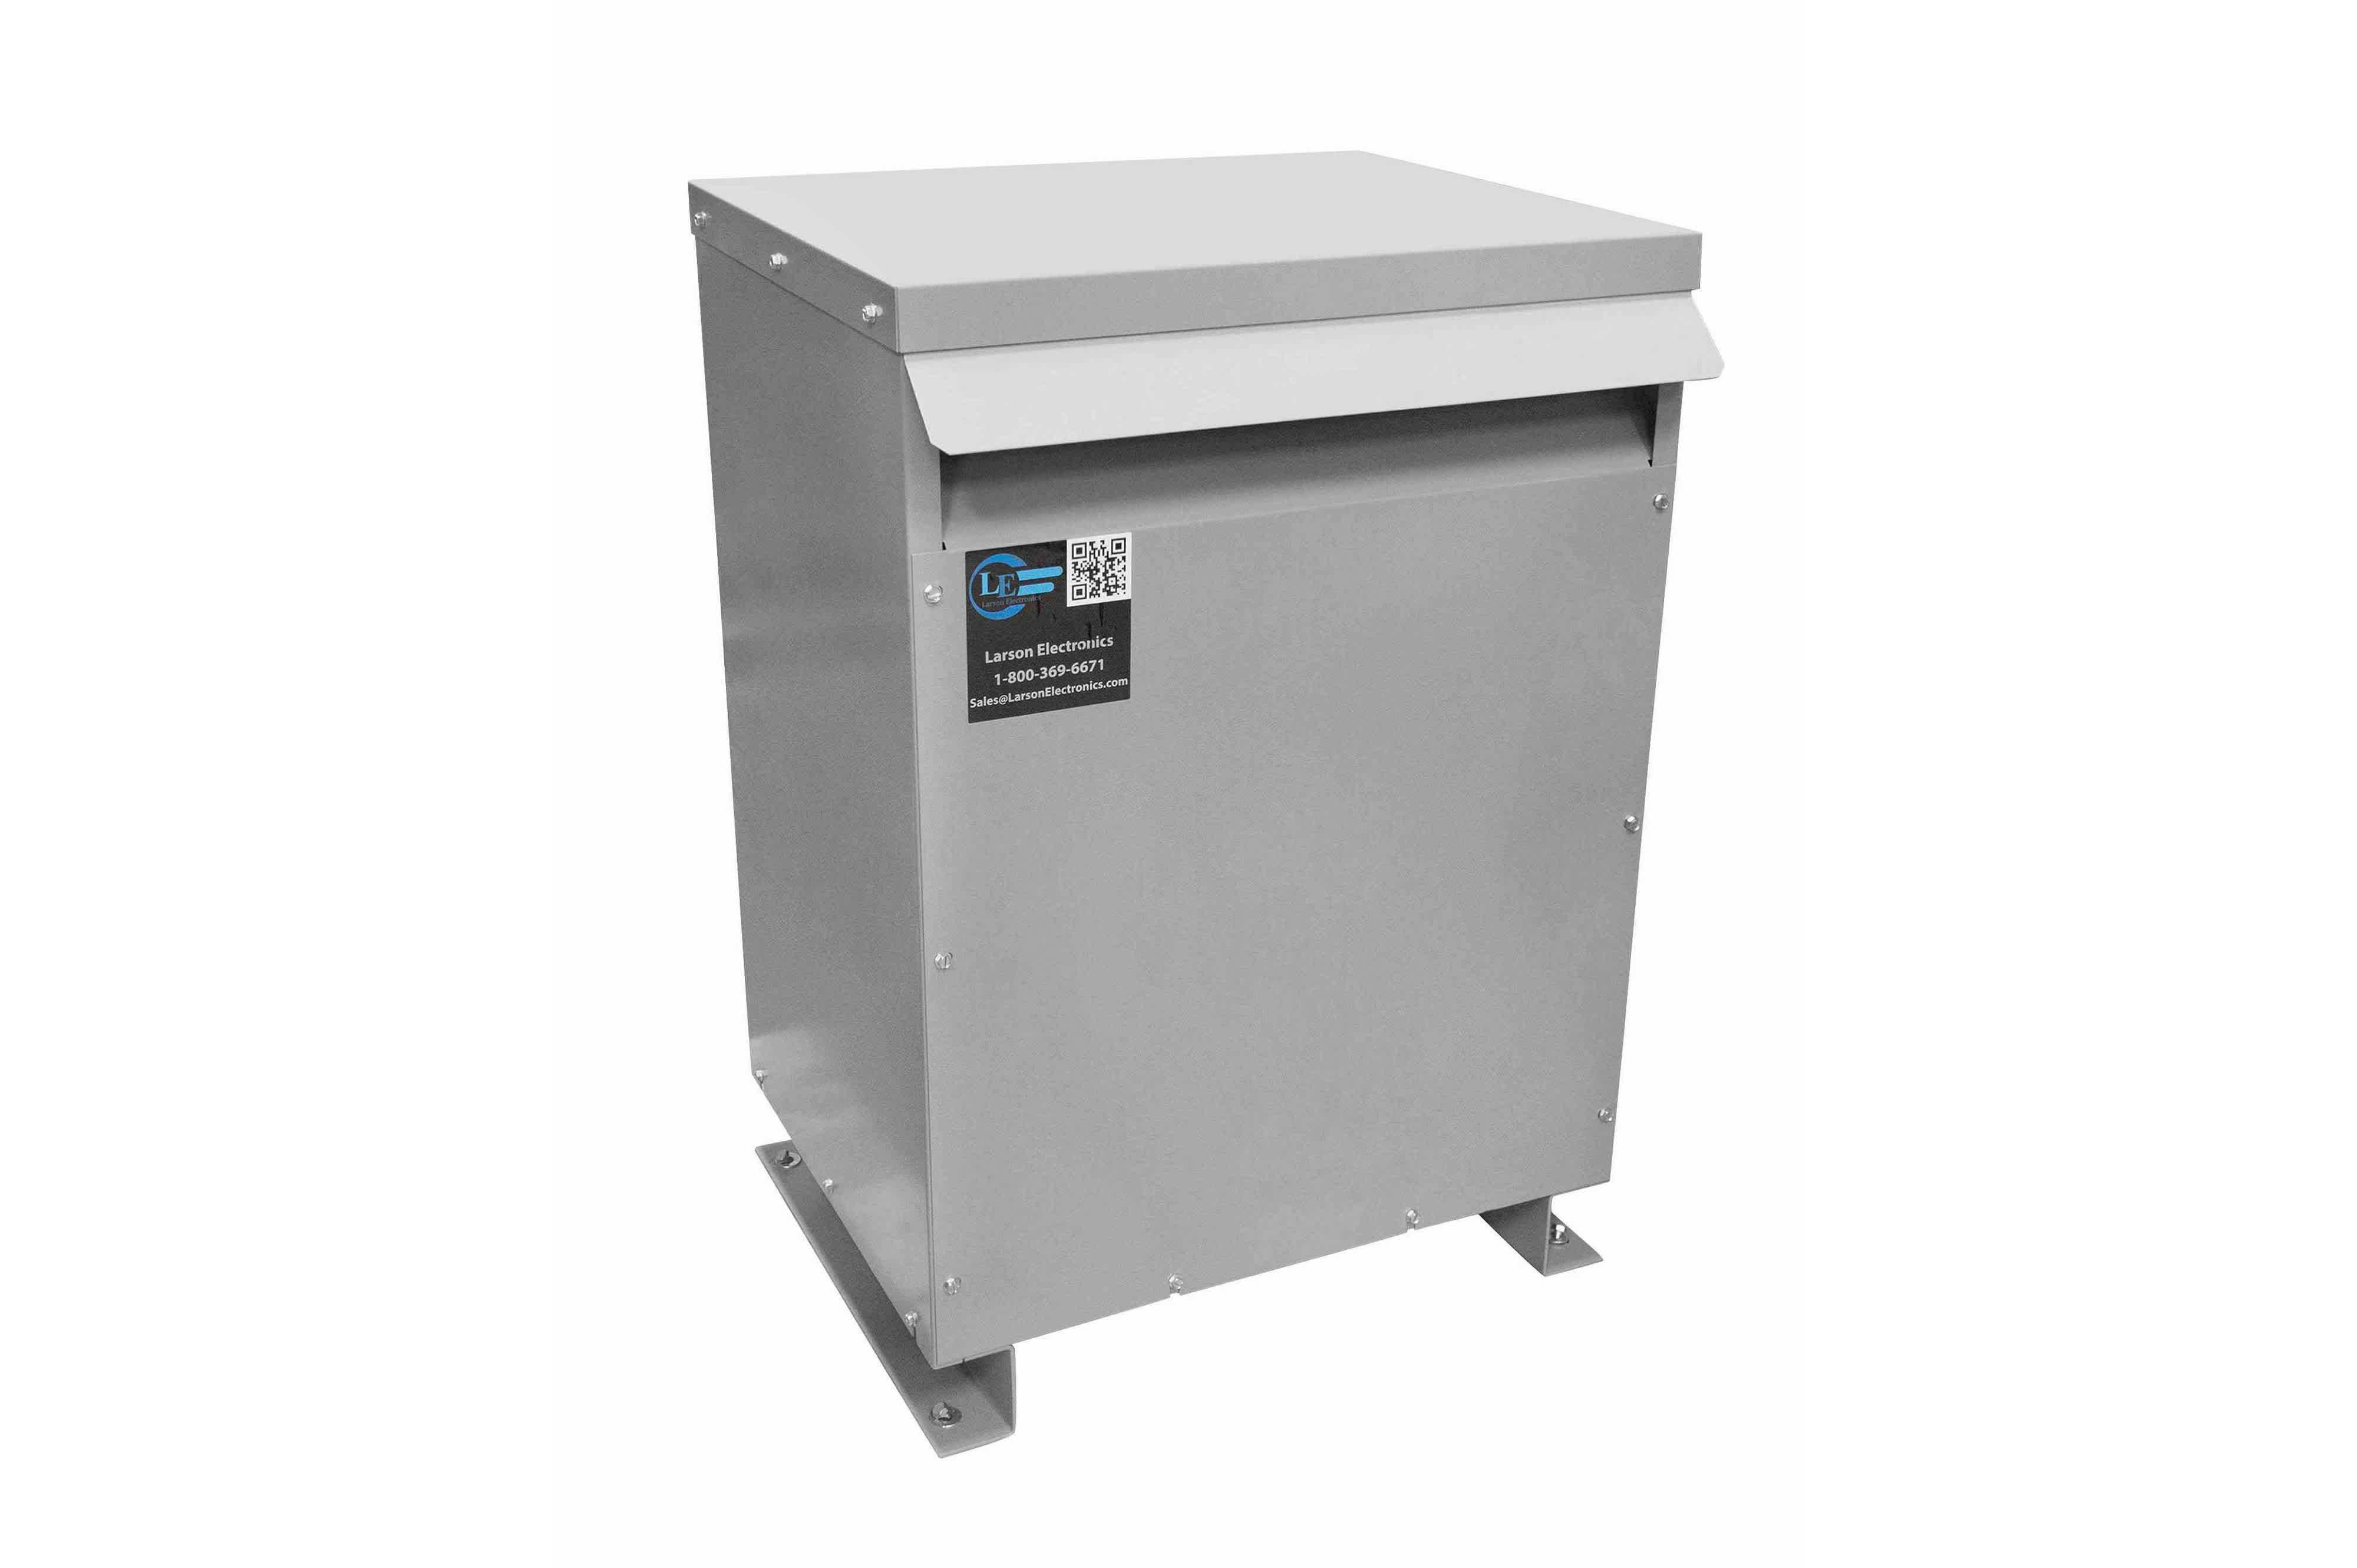 27 kVA 3PH Isolation Transformer, 380V Wye Primary, 600Y/347 Wye-N Secondary, N3R, Ventilated, 60 Hz